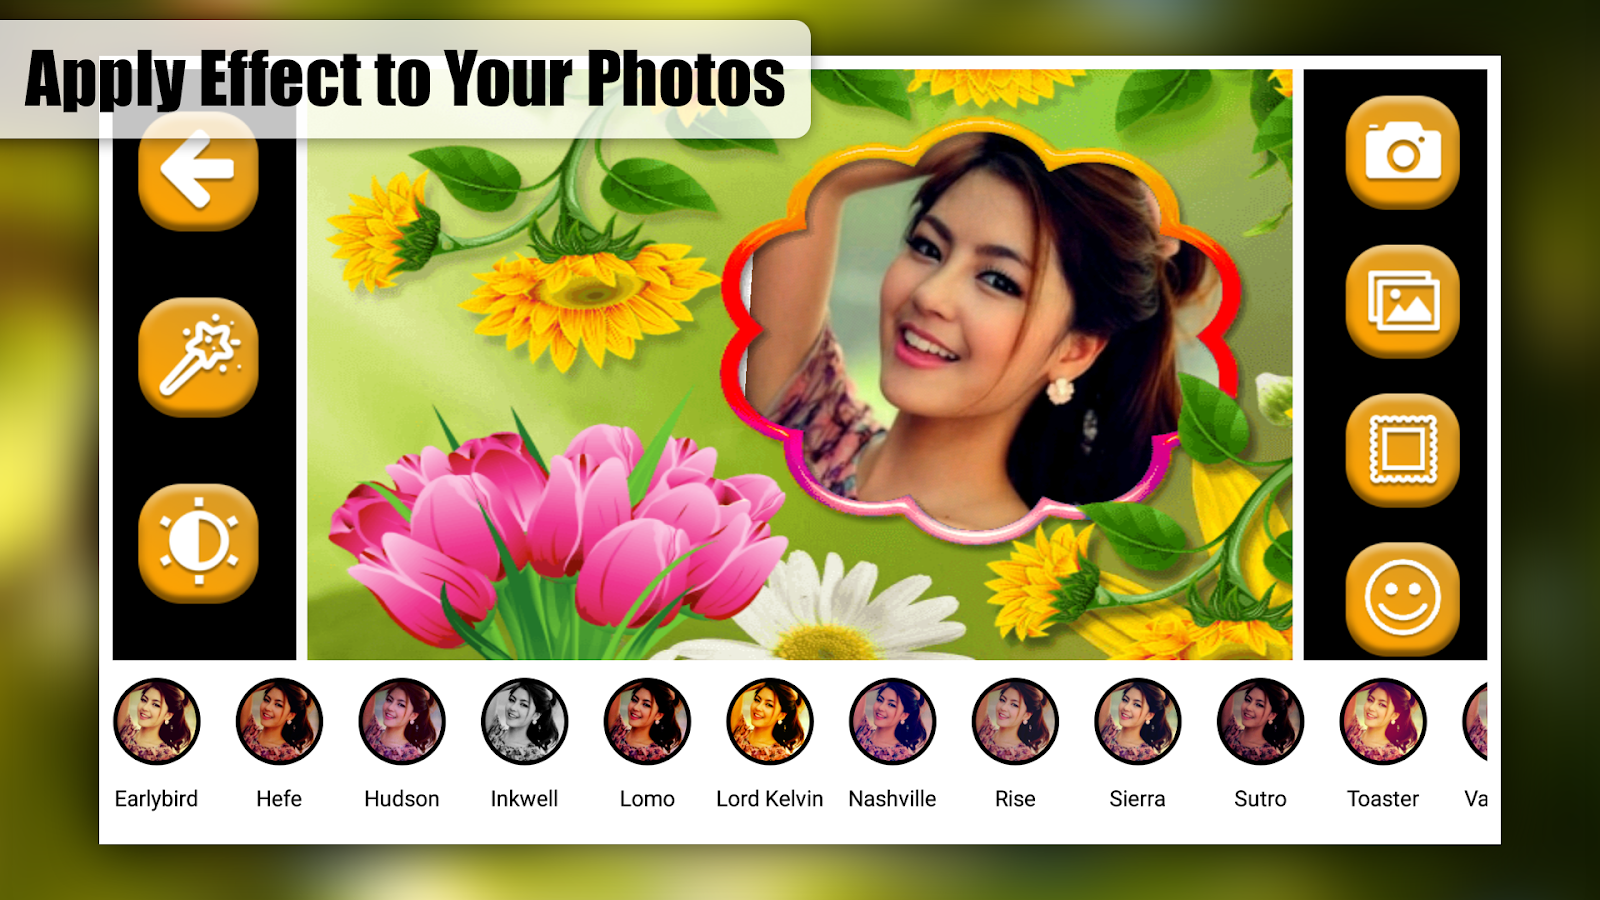 Love flower nature photo editor photo frames hd 13 apk download love flower nature photo editor photo frames hd 13 screenshot 1 izmirmasajfo